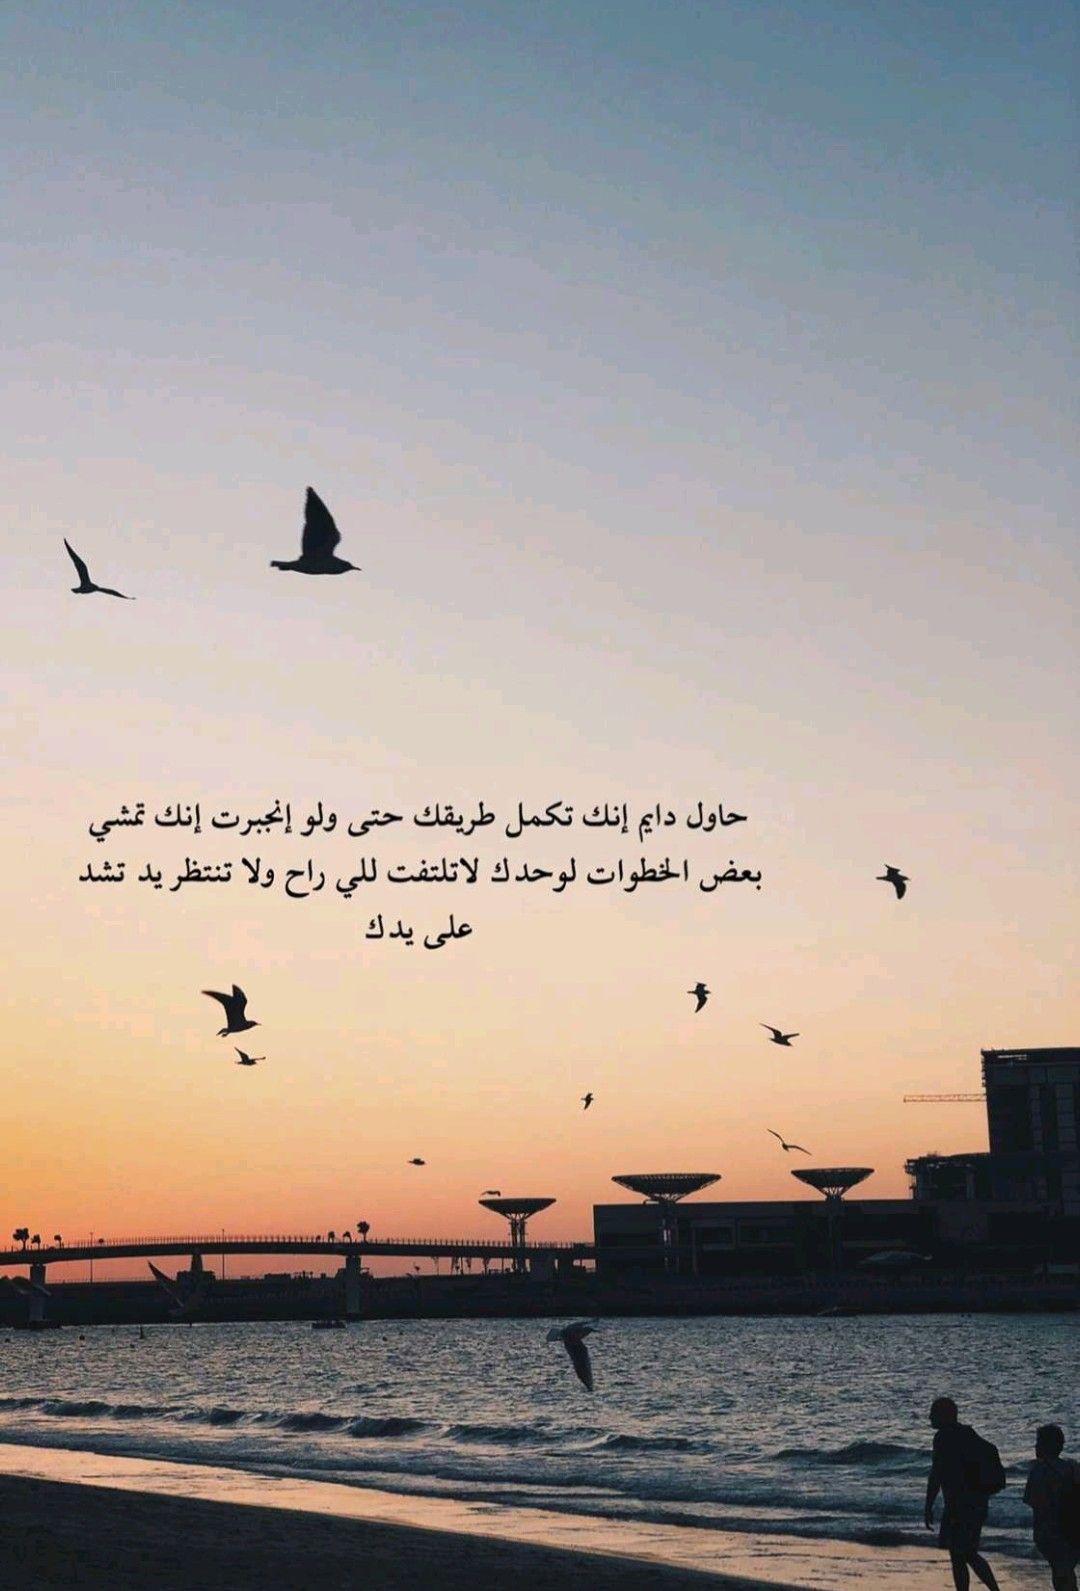 لاتنتظر Arabic Quotes Love Quotes Photos Medical Quotes